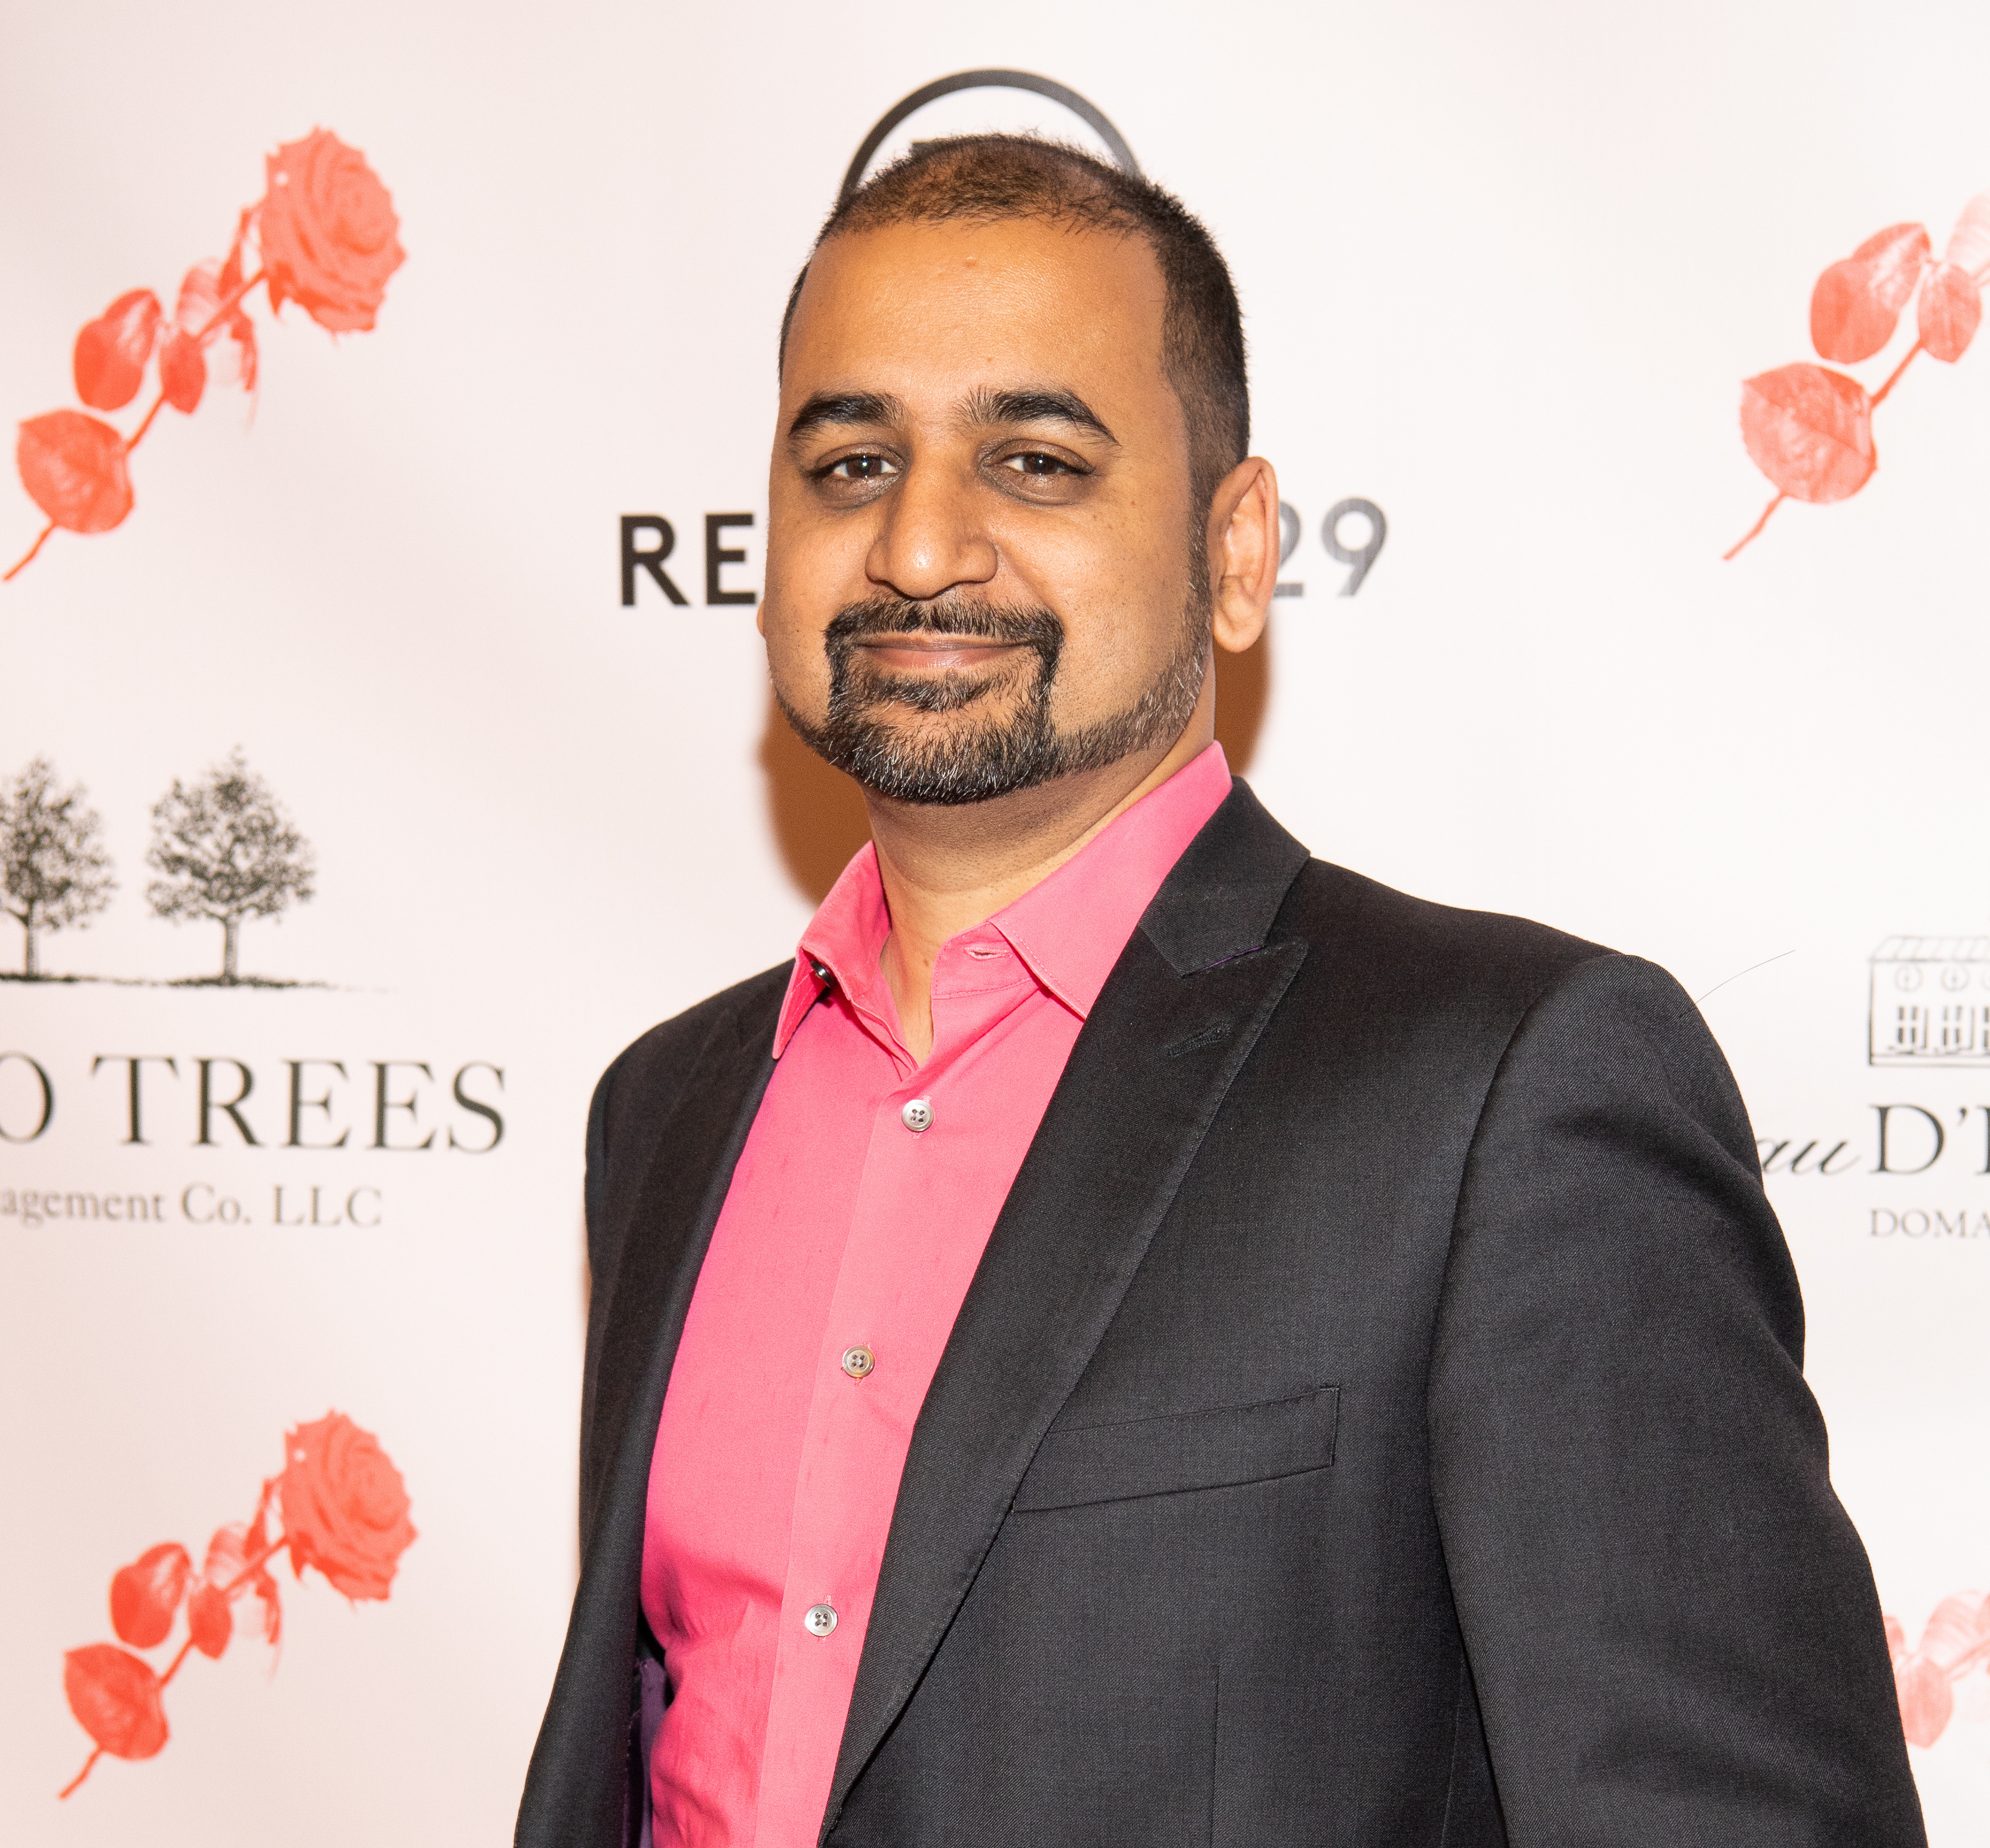 Fog Creek Software CEO Anil Dash